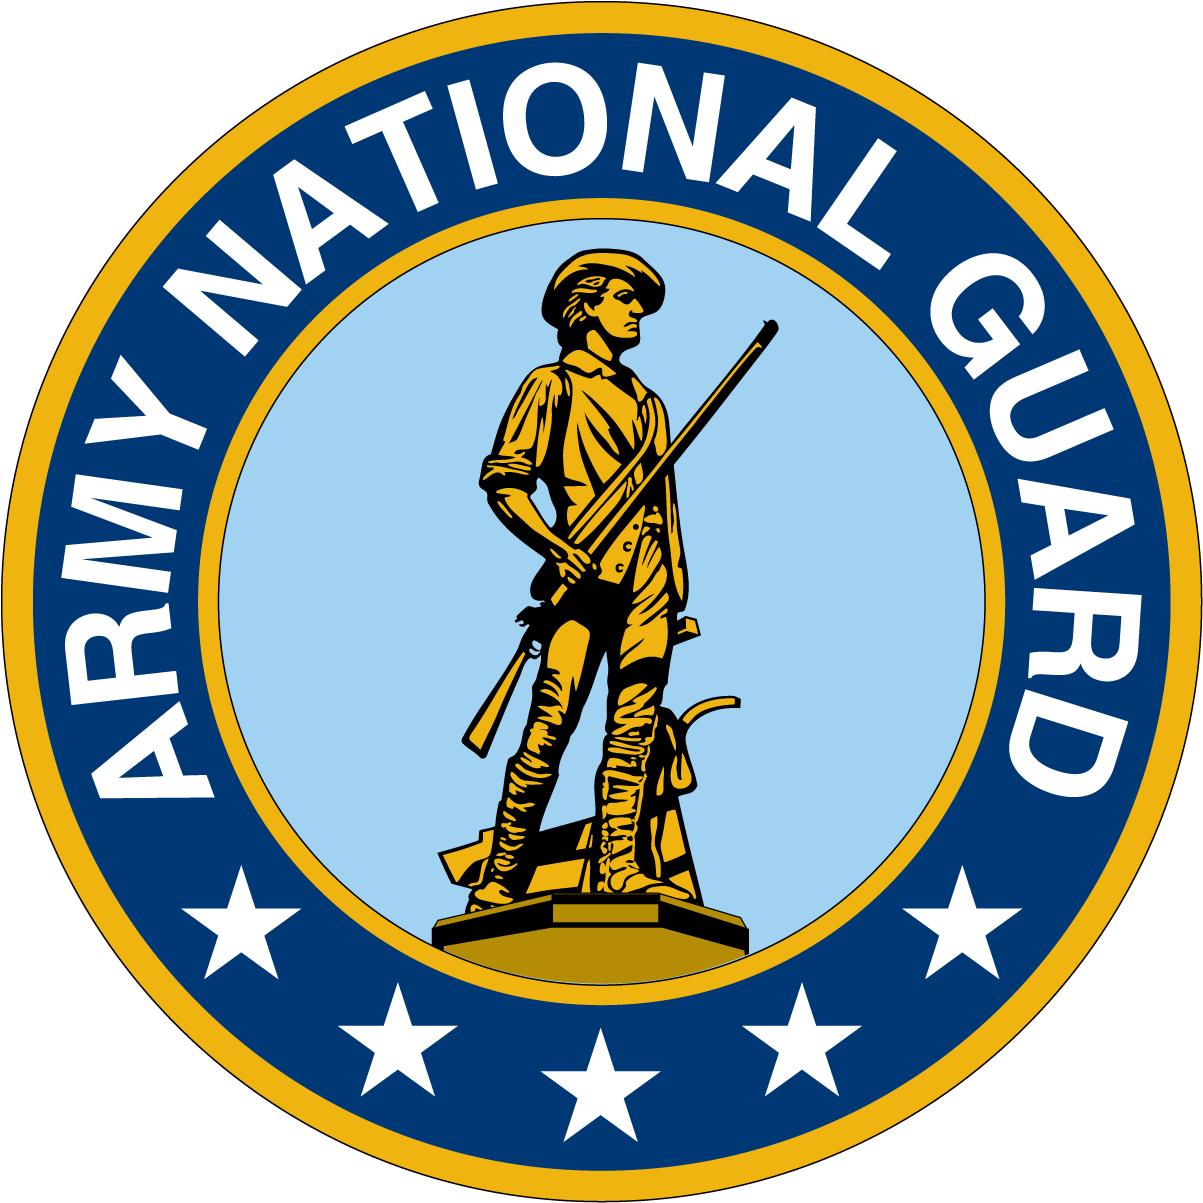 Army_National_Guard_logo